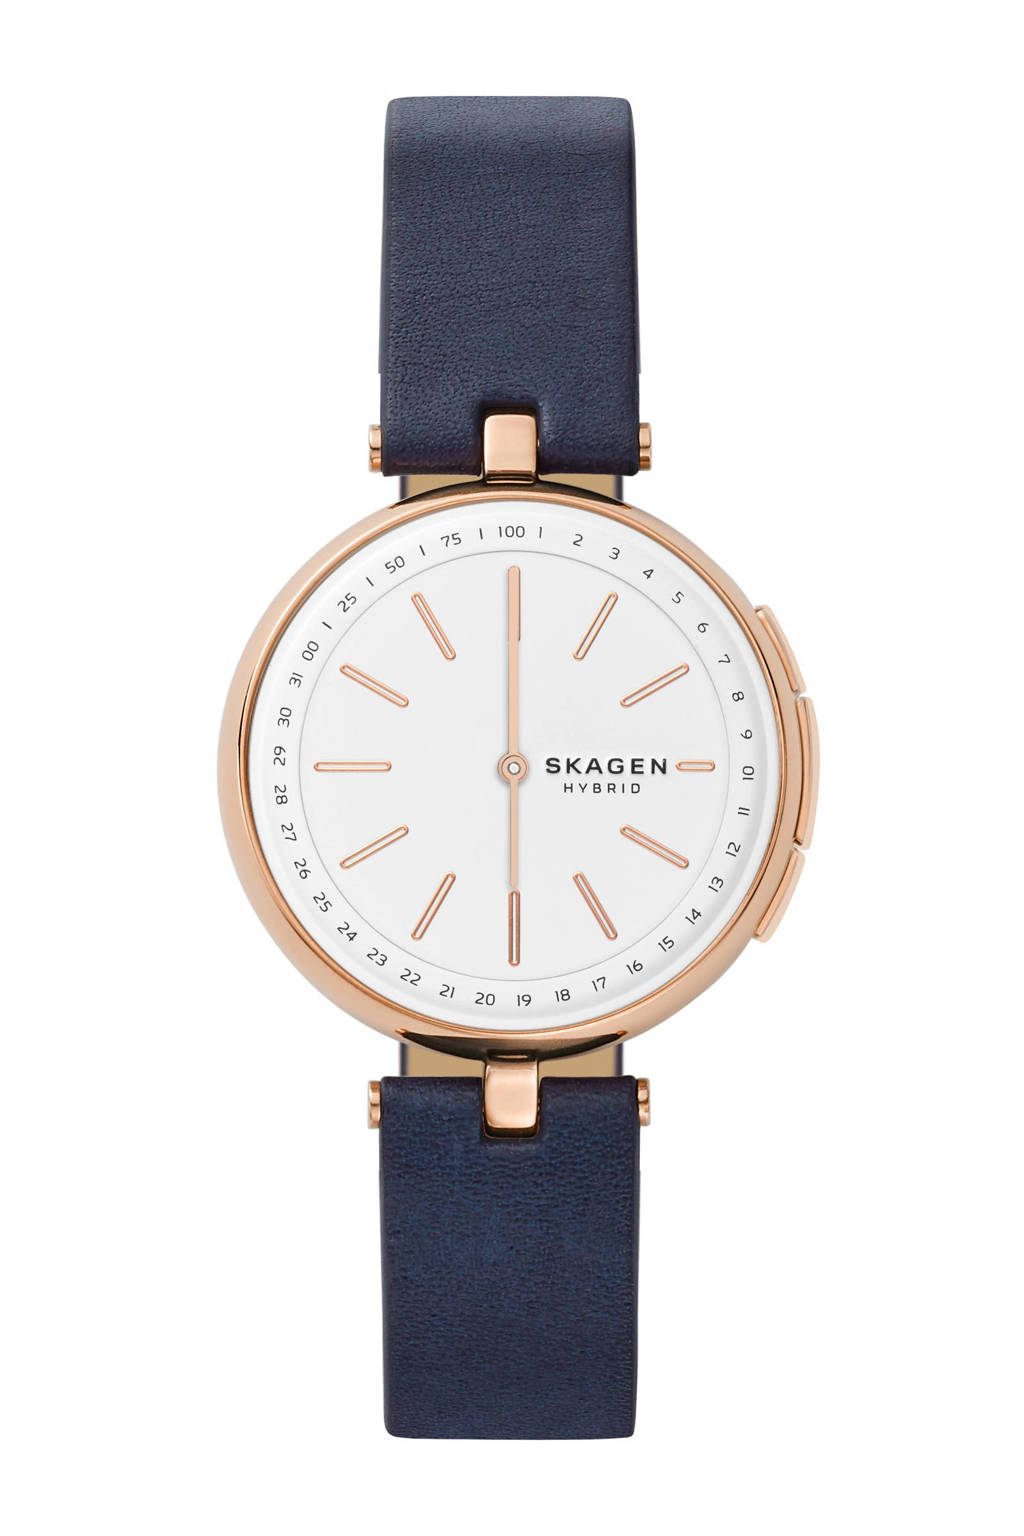 Skagen Connected Signatur hybrid watch - SKT1412, Rosé goud